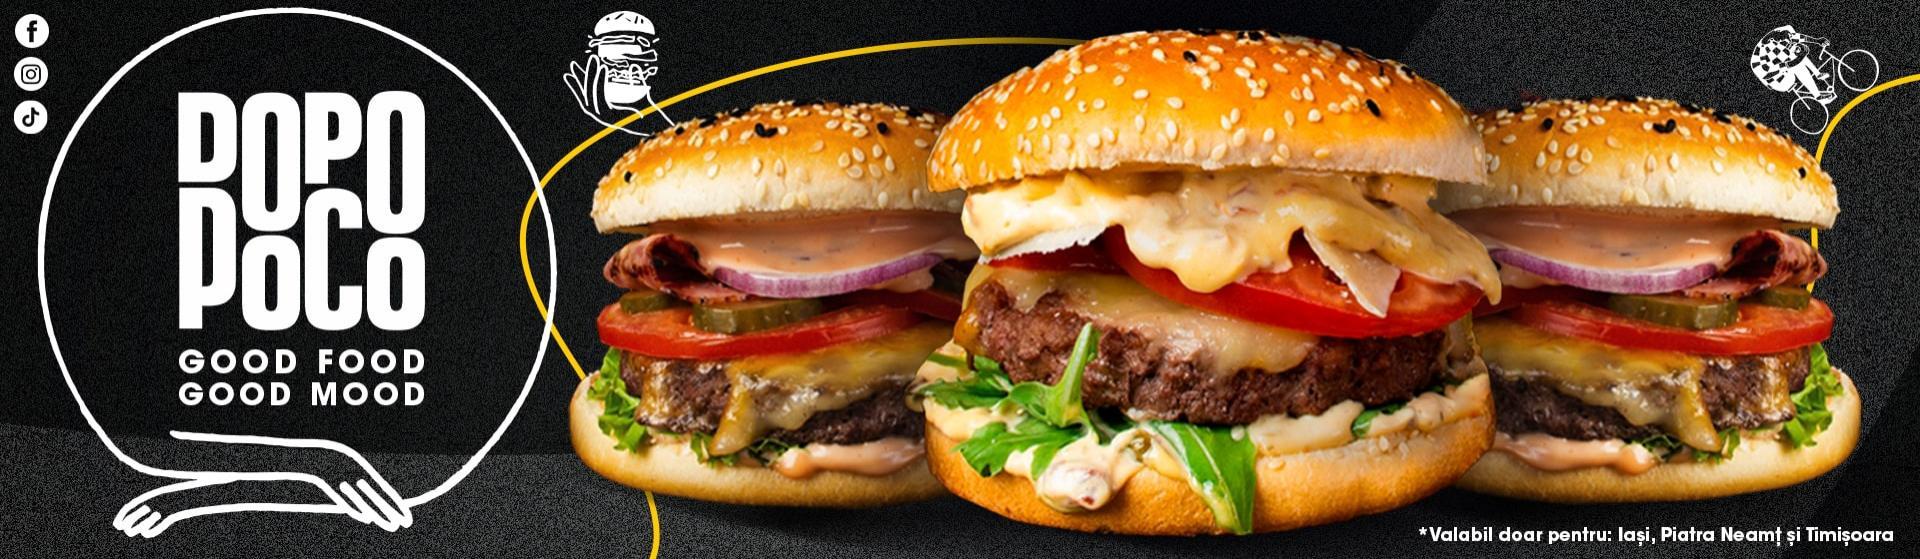 Banner-dopo-burgers